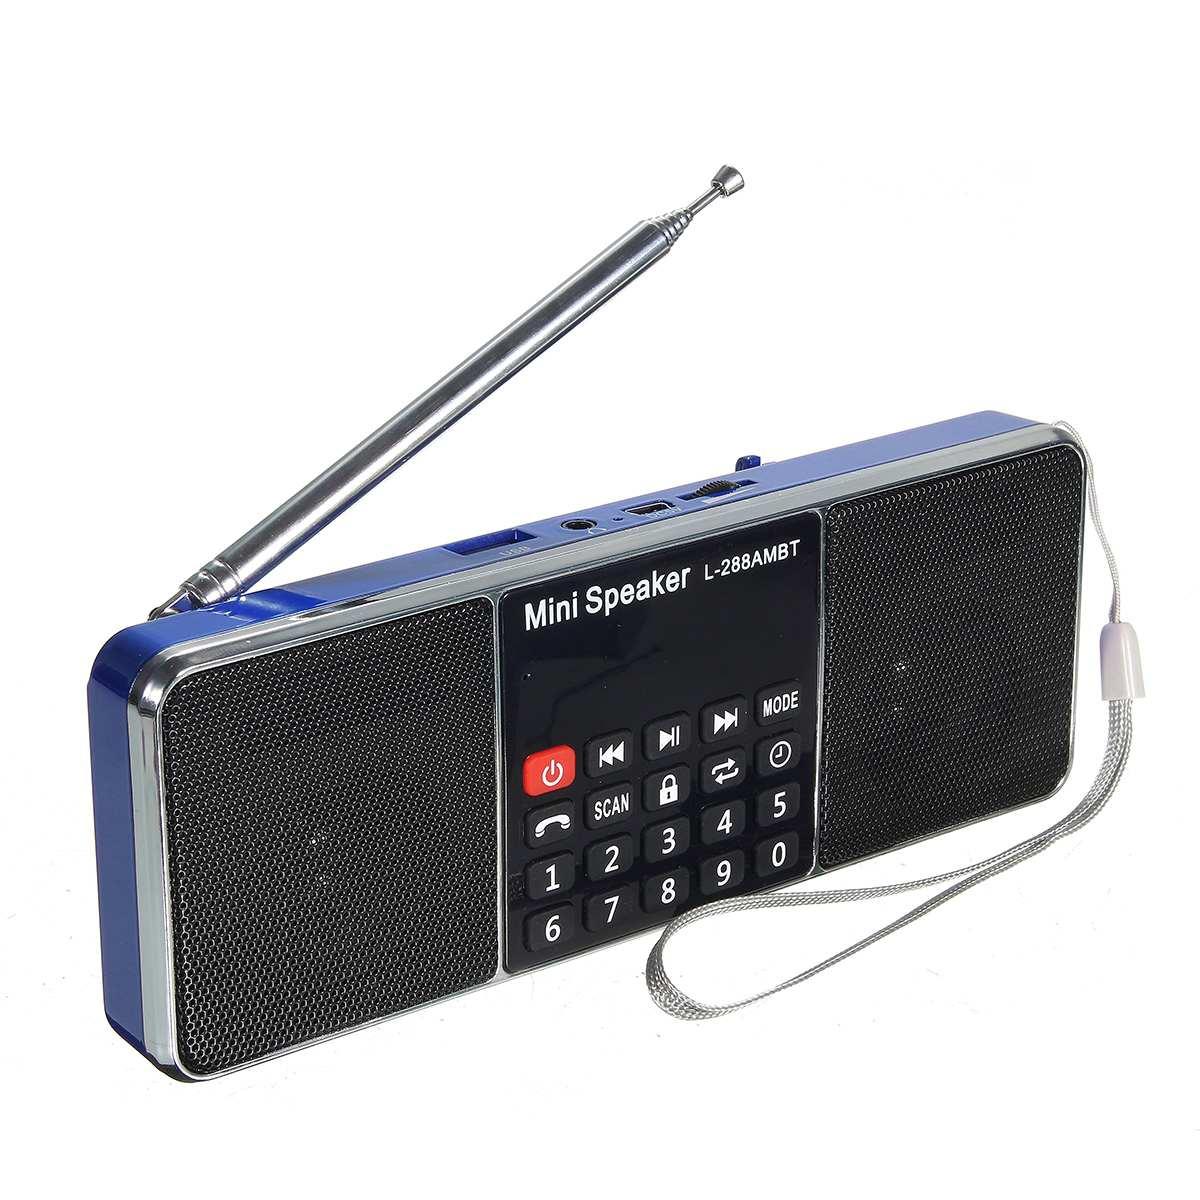 Professioneller Verkauf Neue Bluetooth Tragbare Lcd Fm/am Radio Stereo Lautsprecher Mp3 Musik Player Micro Für Sd Usb Dual Lautsprecher Radio Tragbares Audio & Video